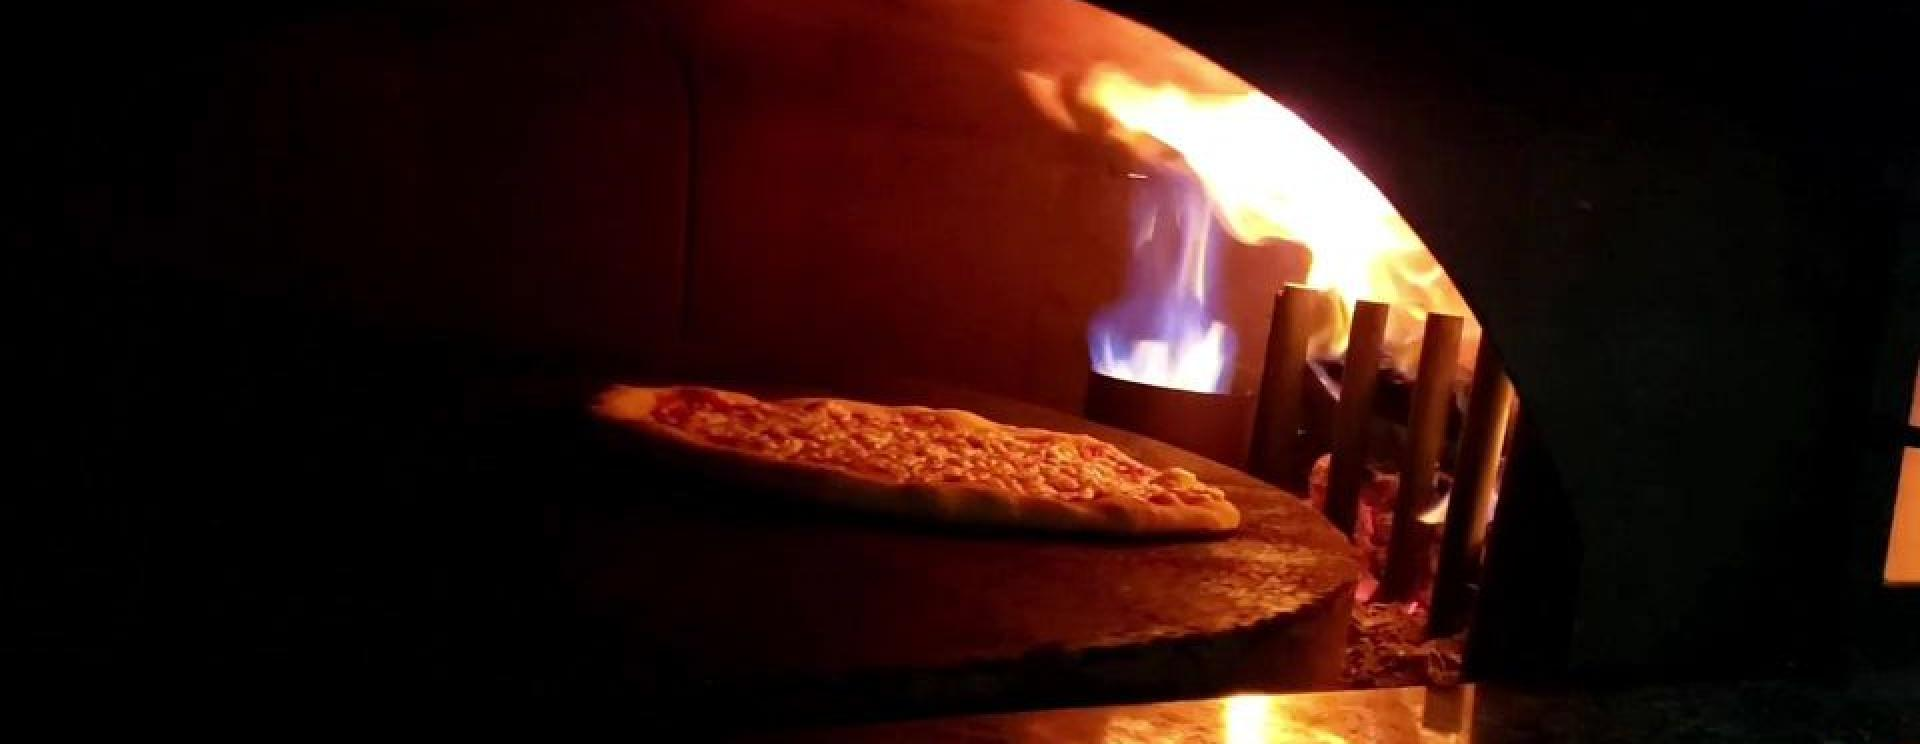 Mangiamo Pizzeria